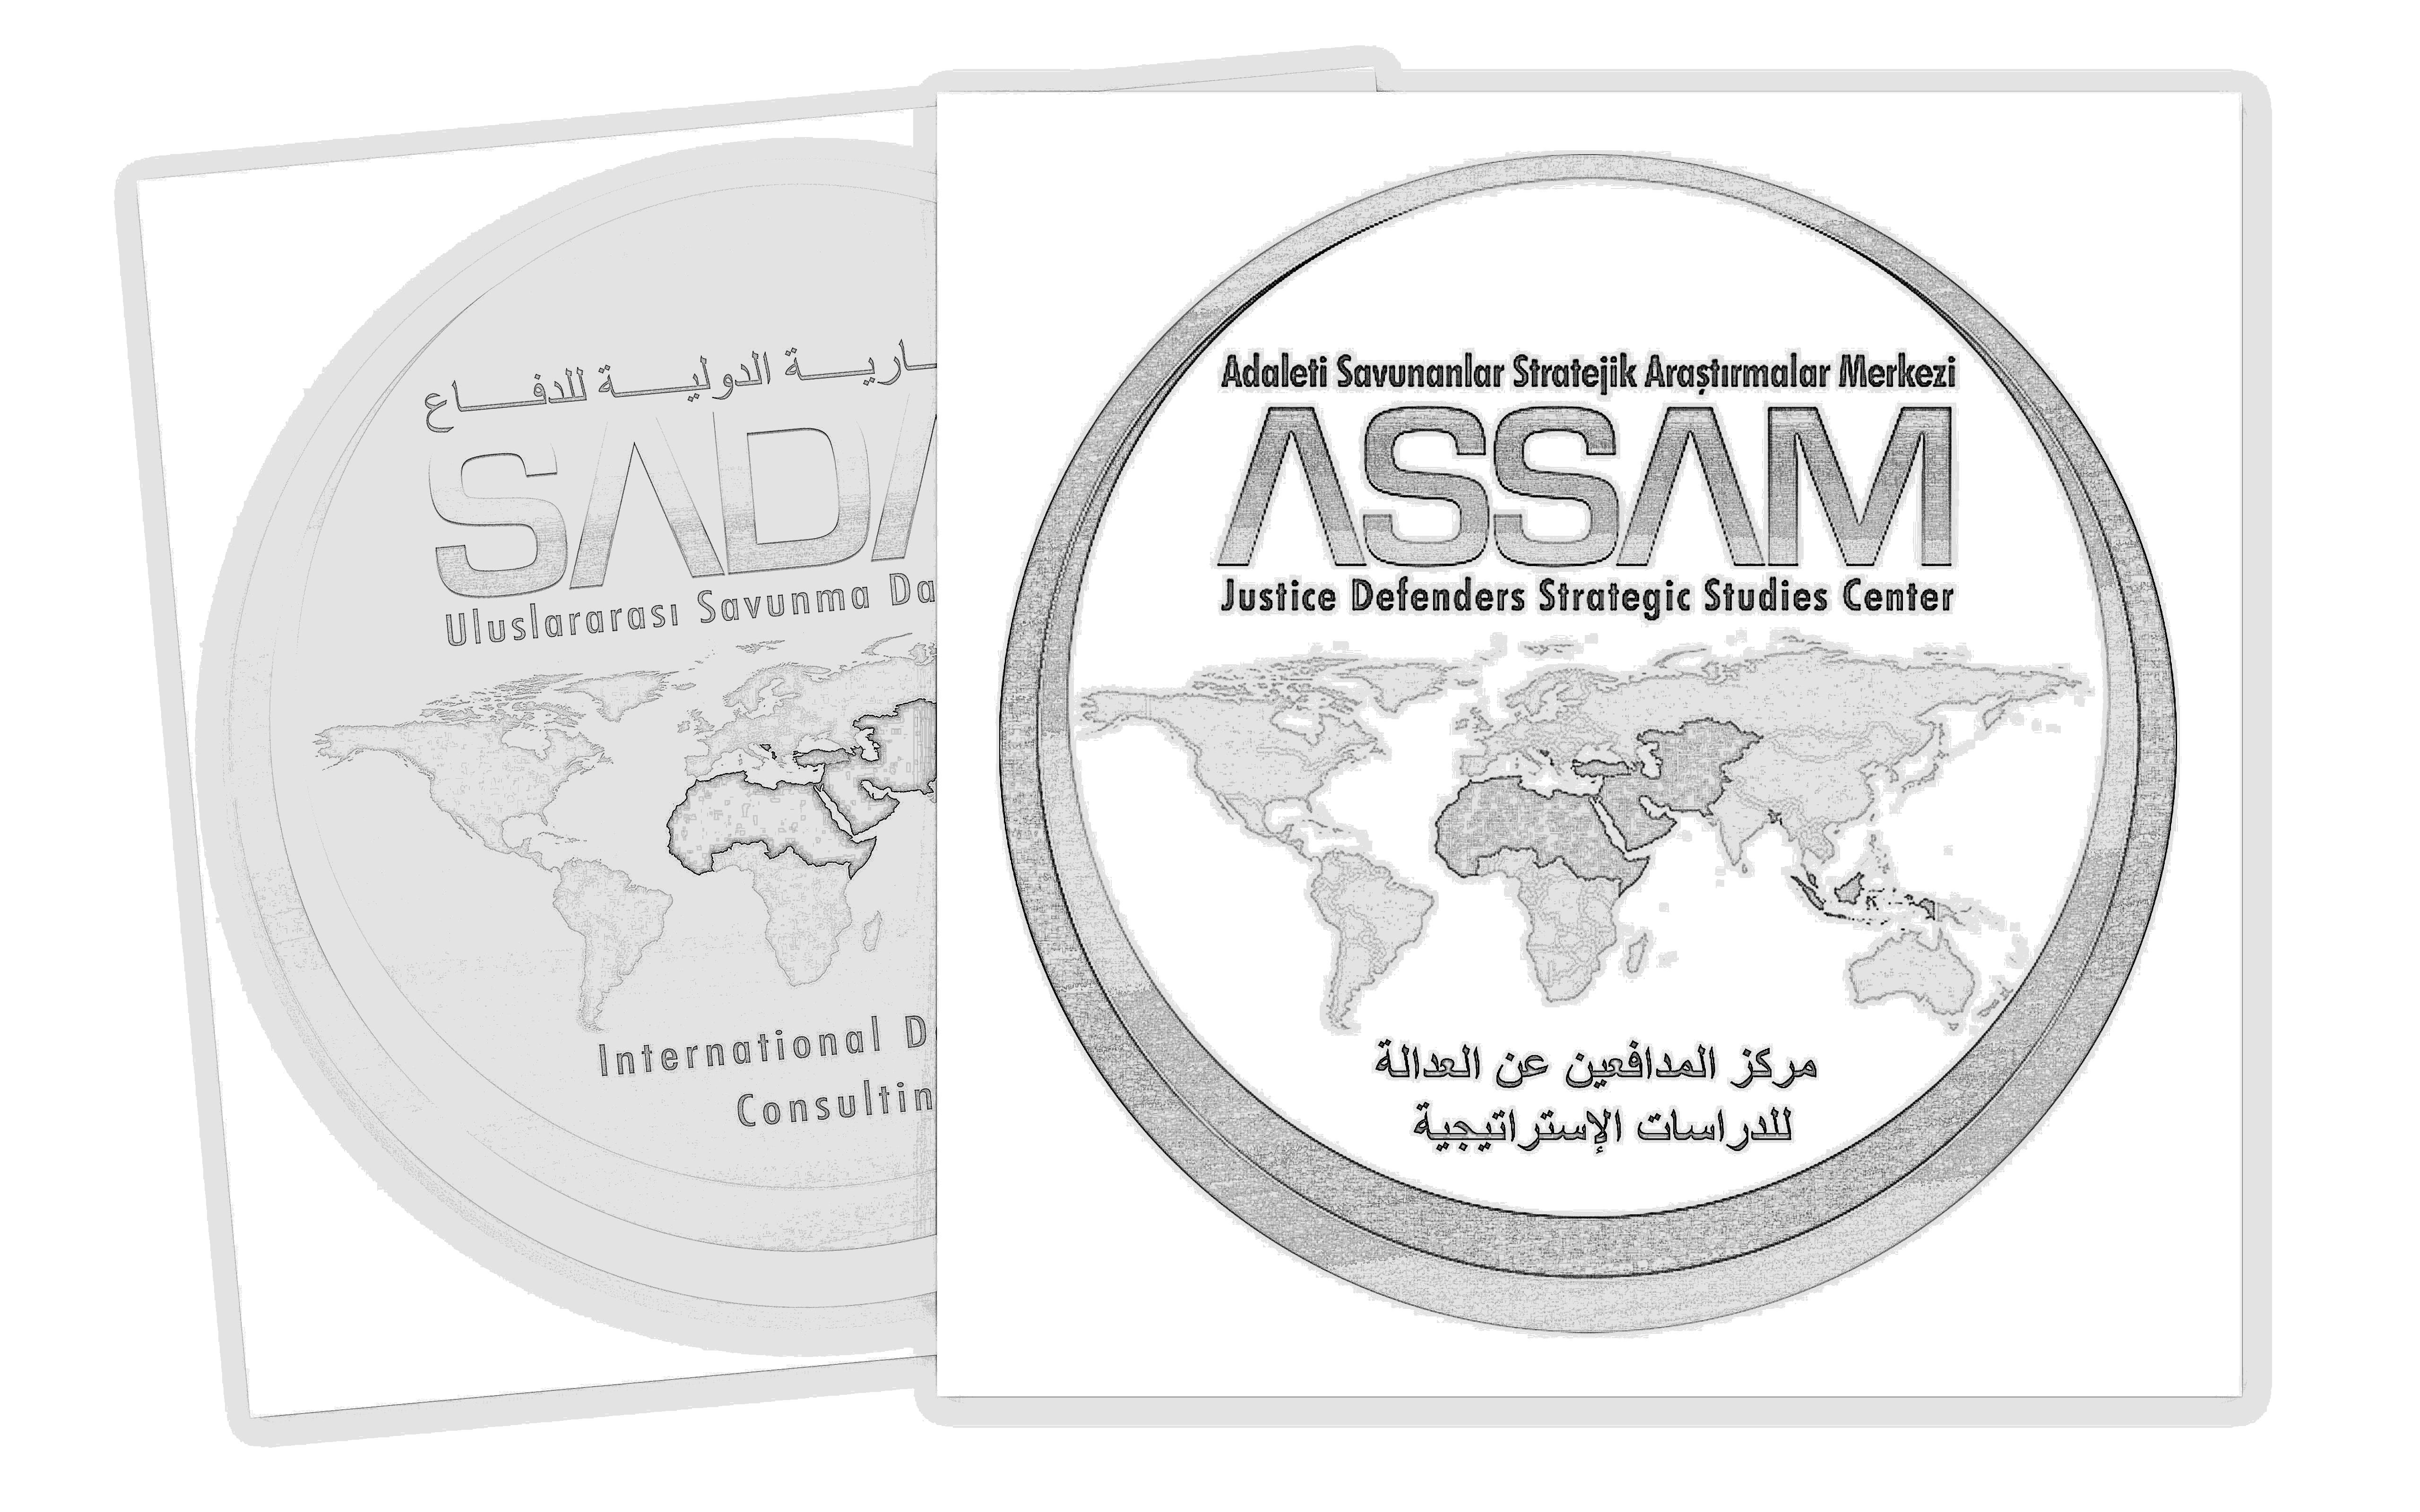 Iصادات وASSAM كعناصر قوى مرنة